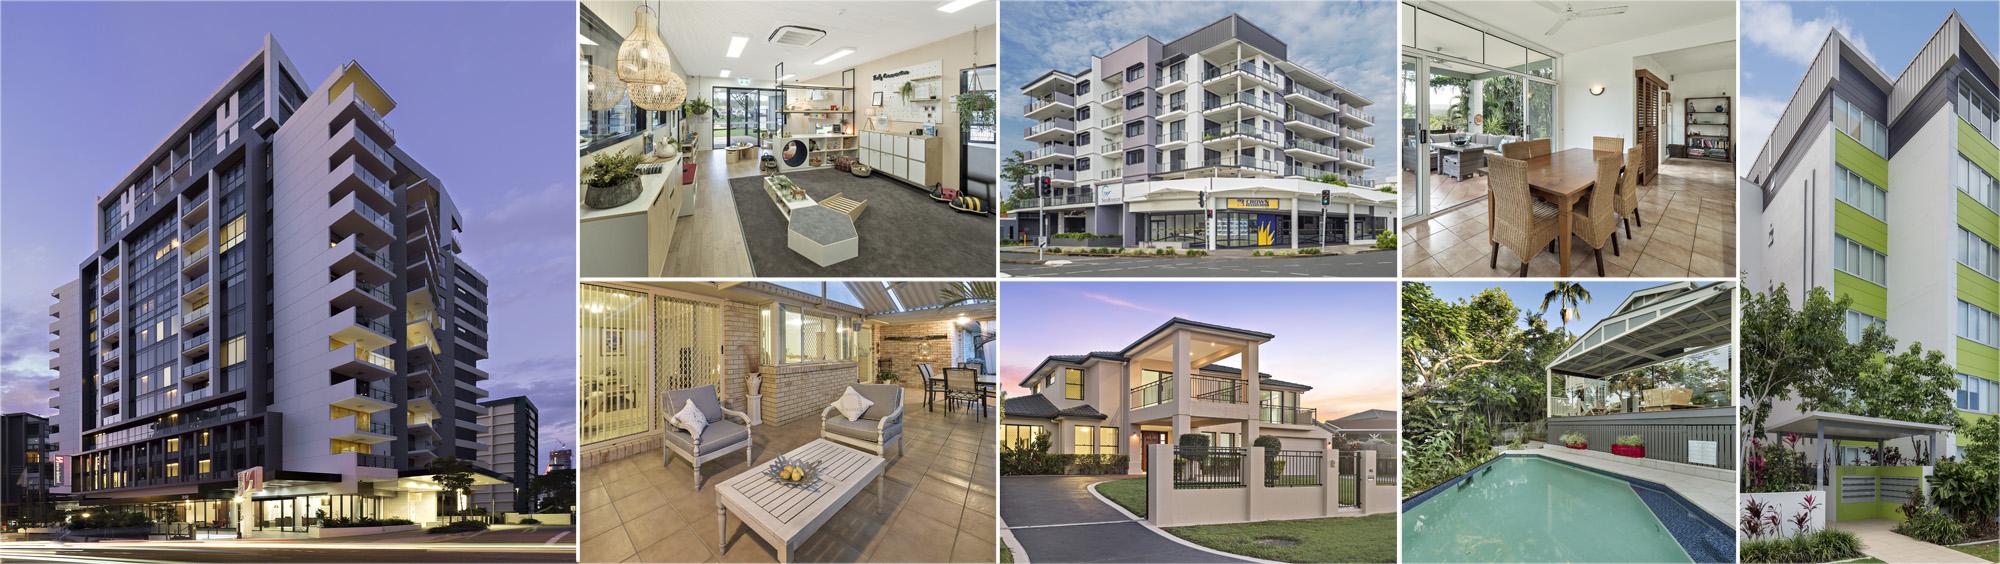 phil savory real estate photography Brisbane